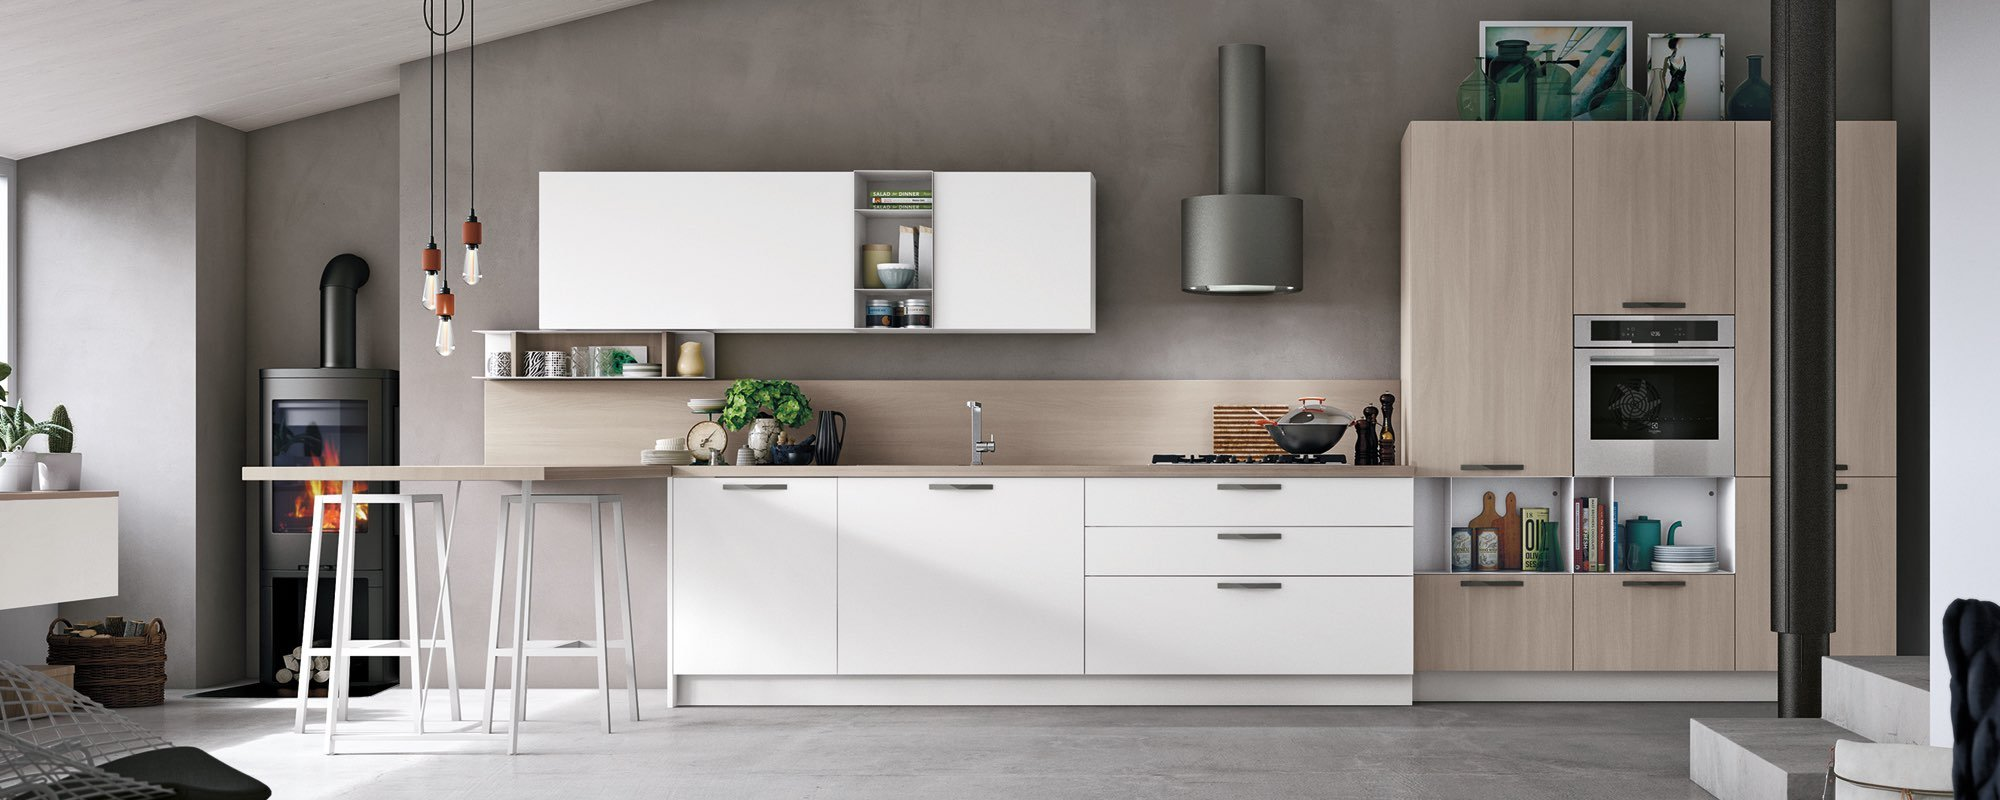 cucina con arredamento bianco